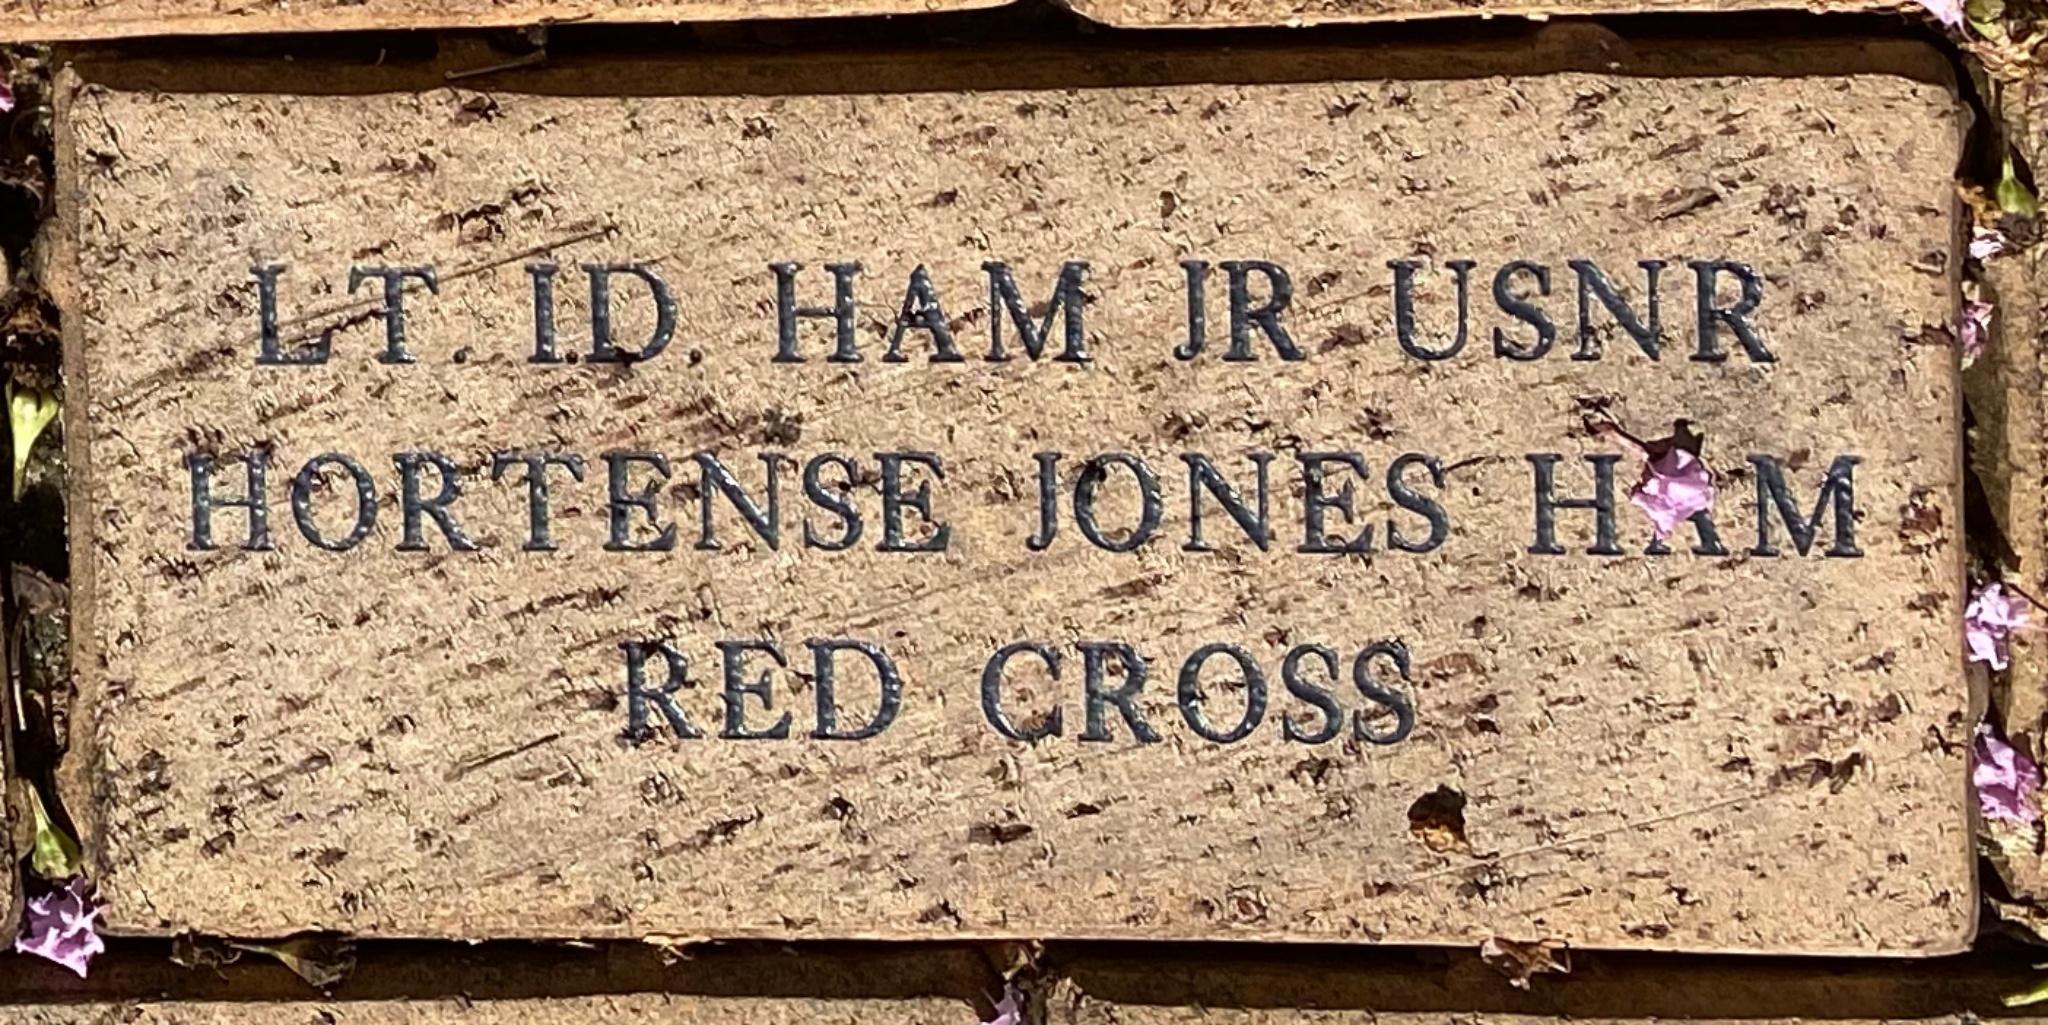 LT. I.D. HAM JR USNR HORTENSE JONES HAM RED CROSS